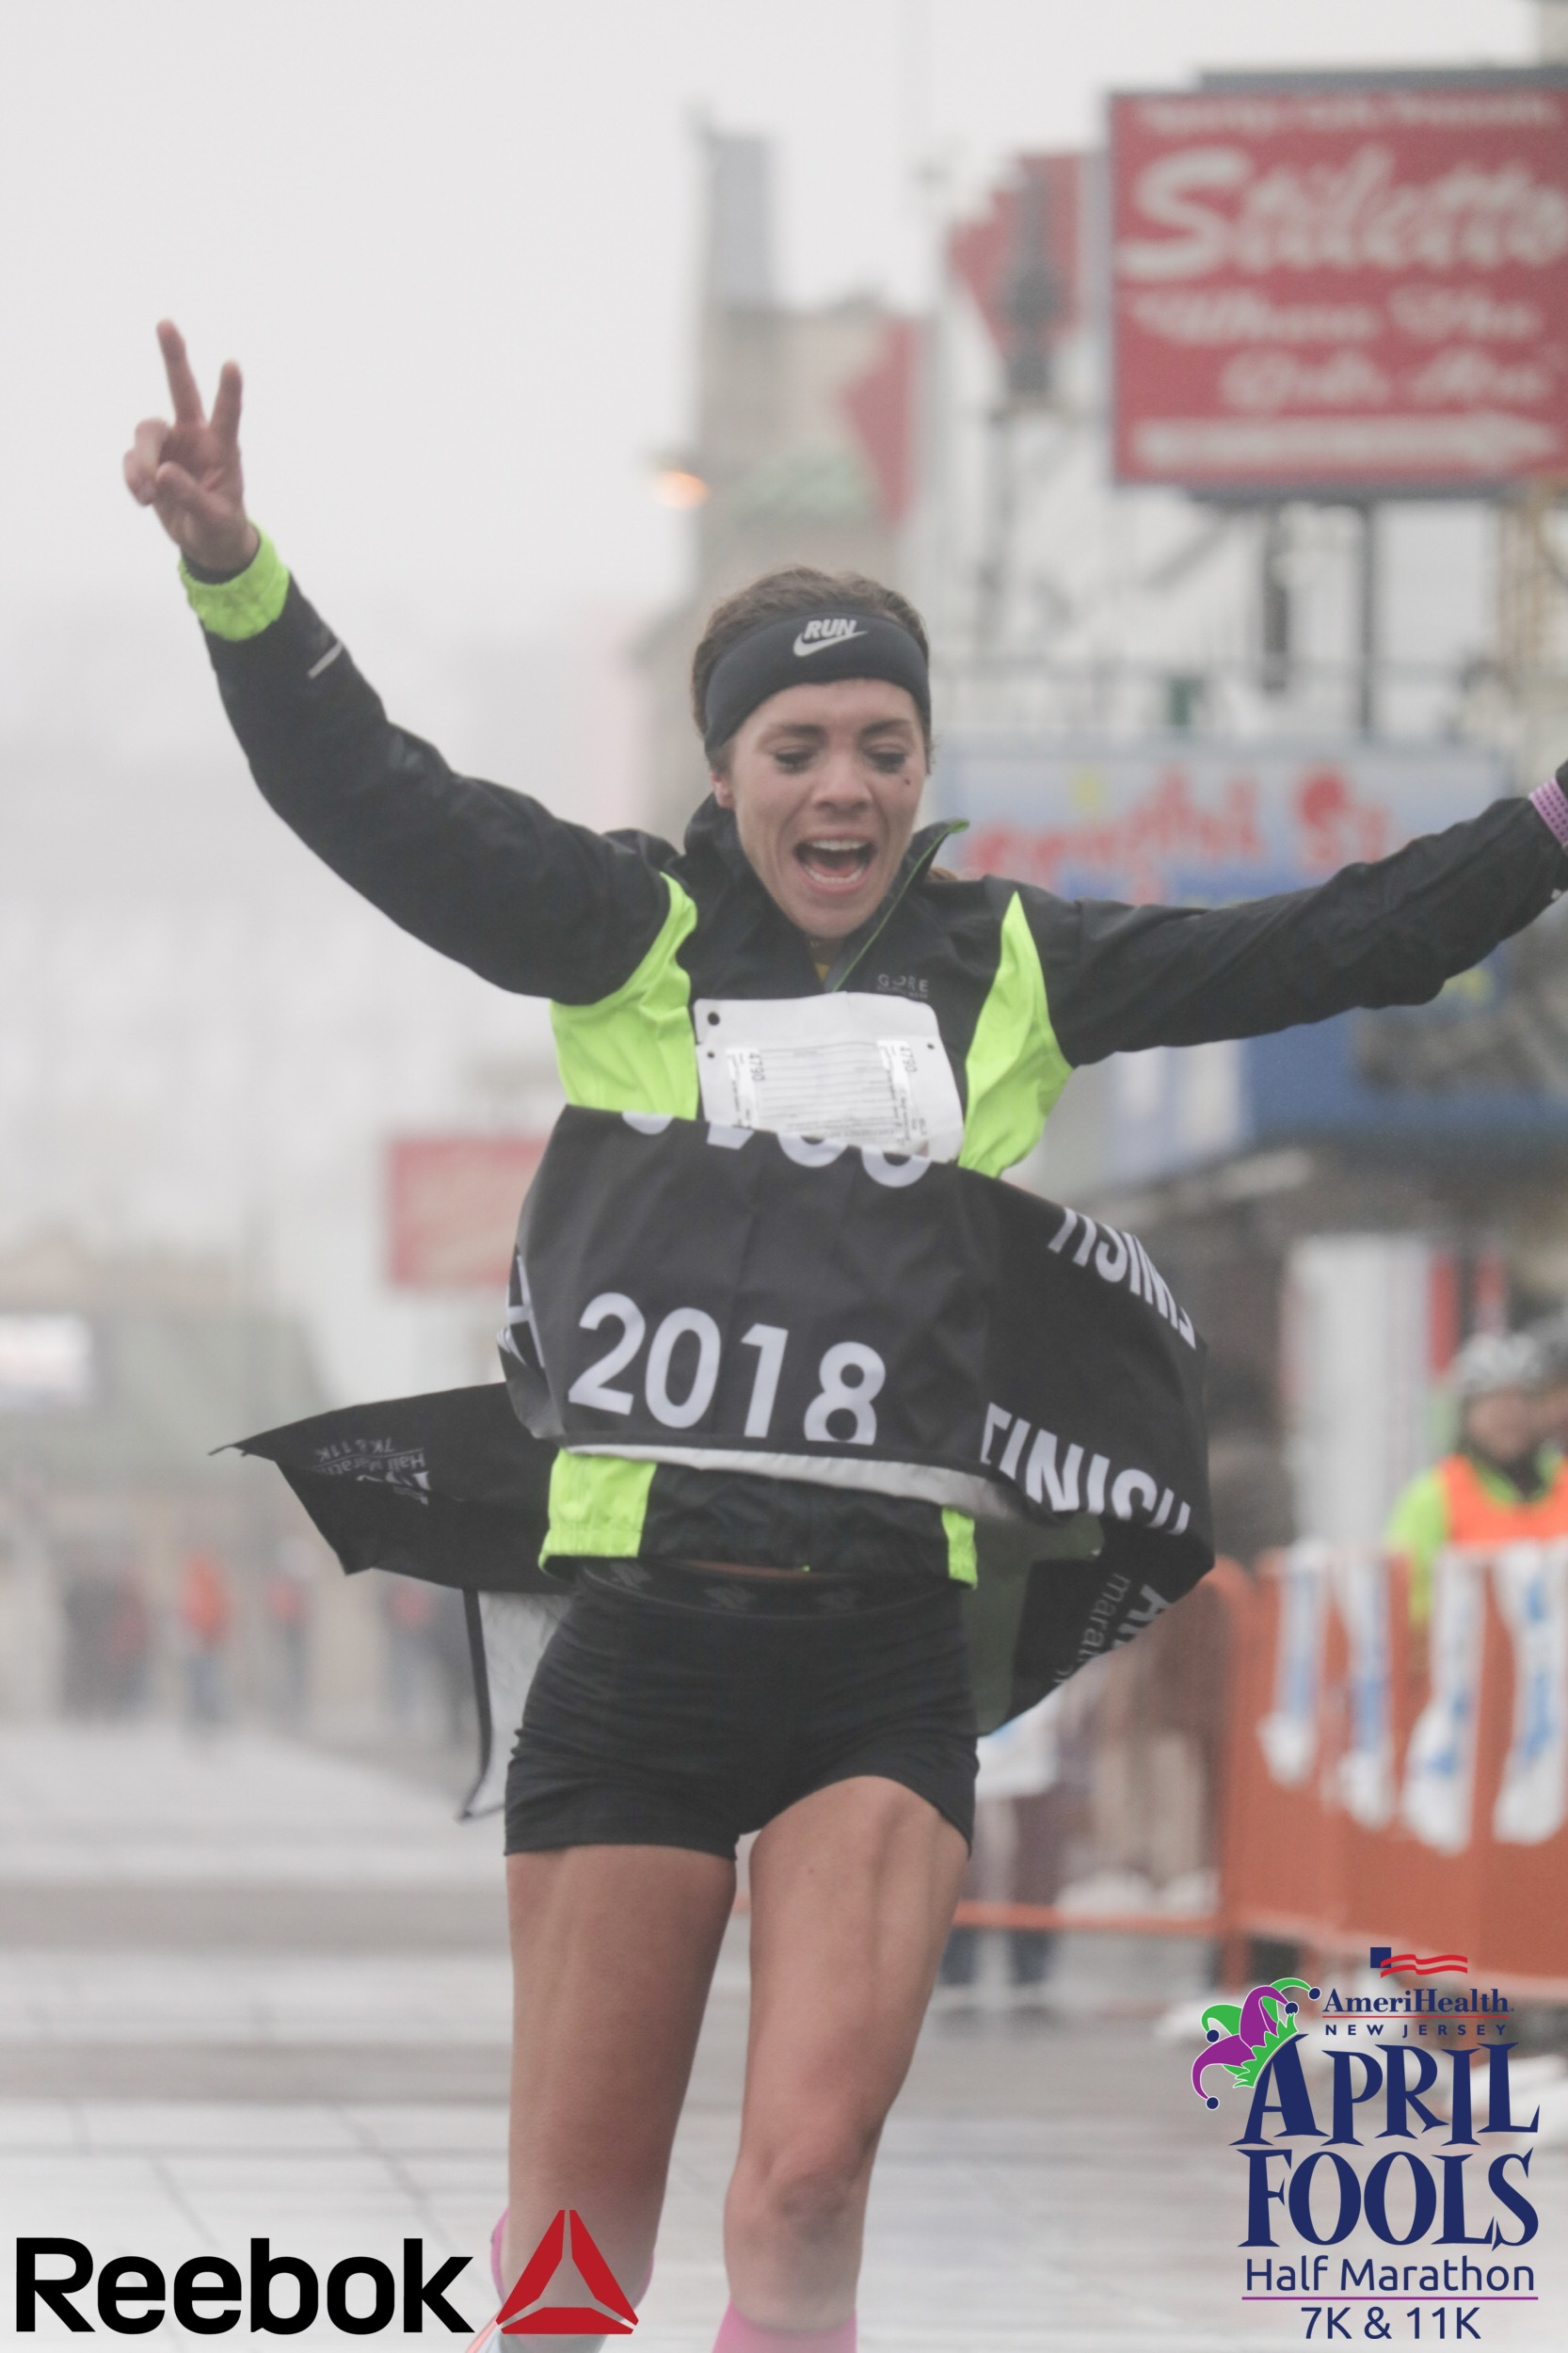 me april fools half marathon atlantic city running 9cf88b0c495